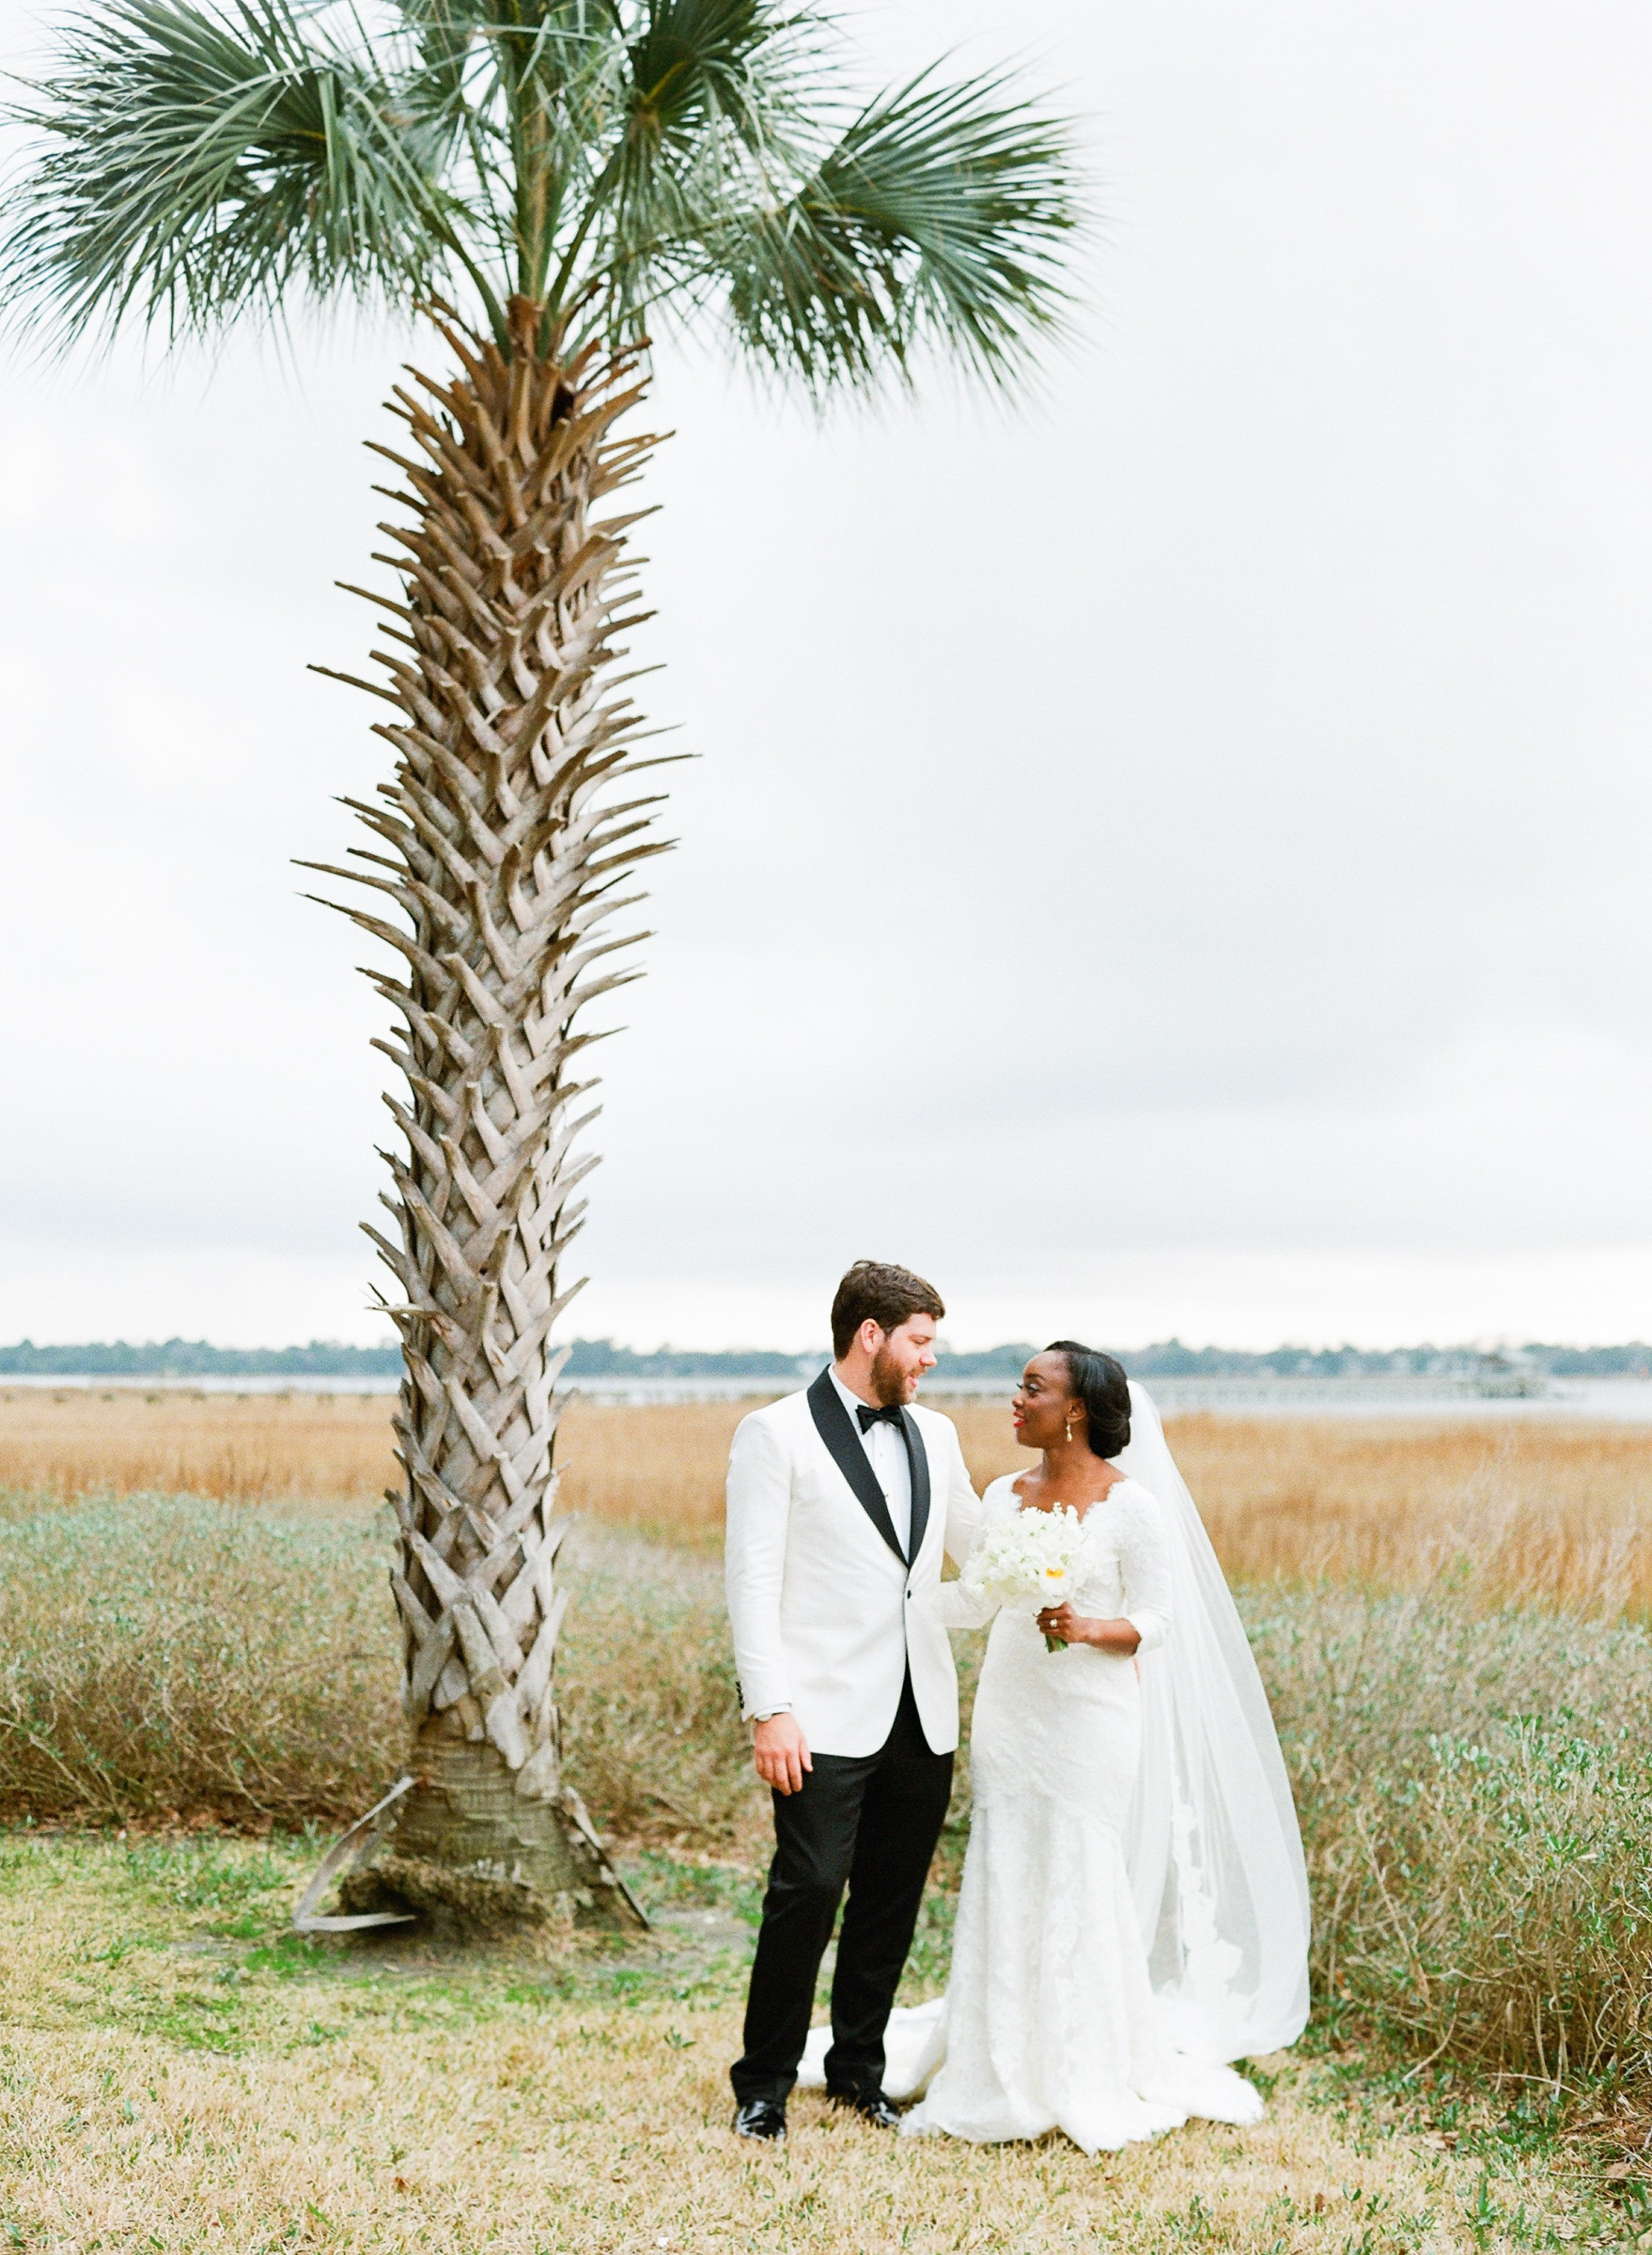 hamida charlie charleson wedding couple